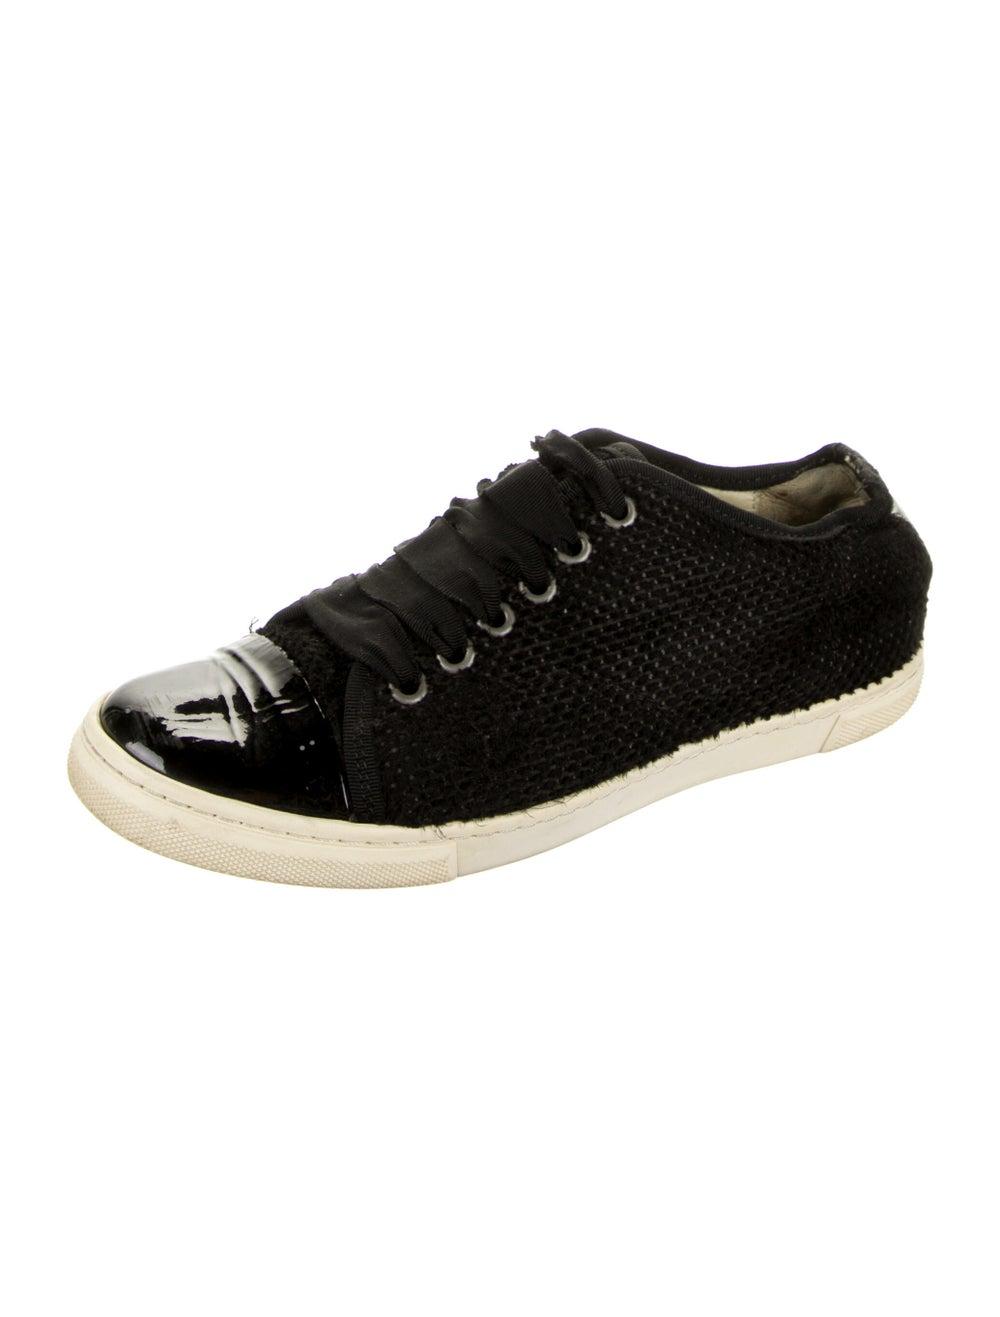 Lanvin Sneakers Black - image 2